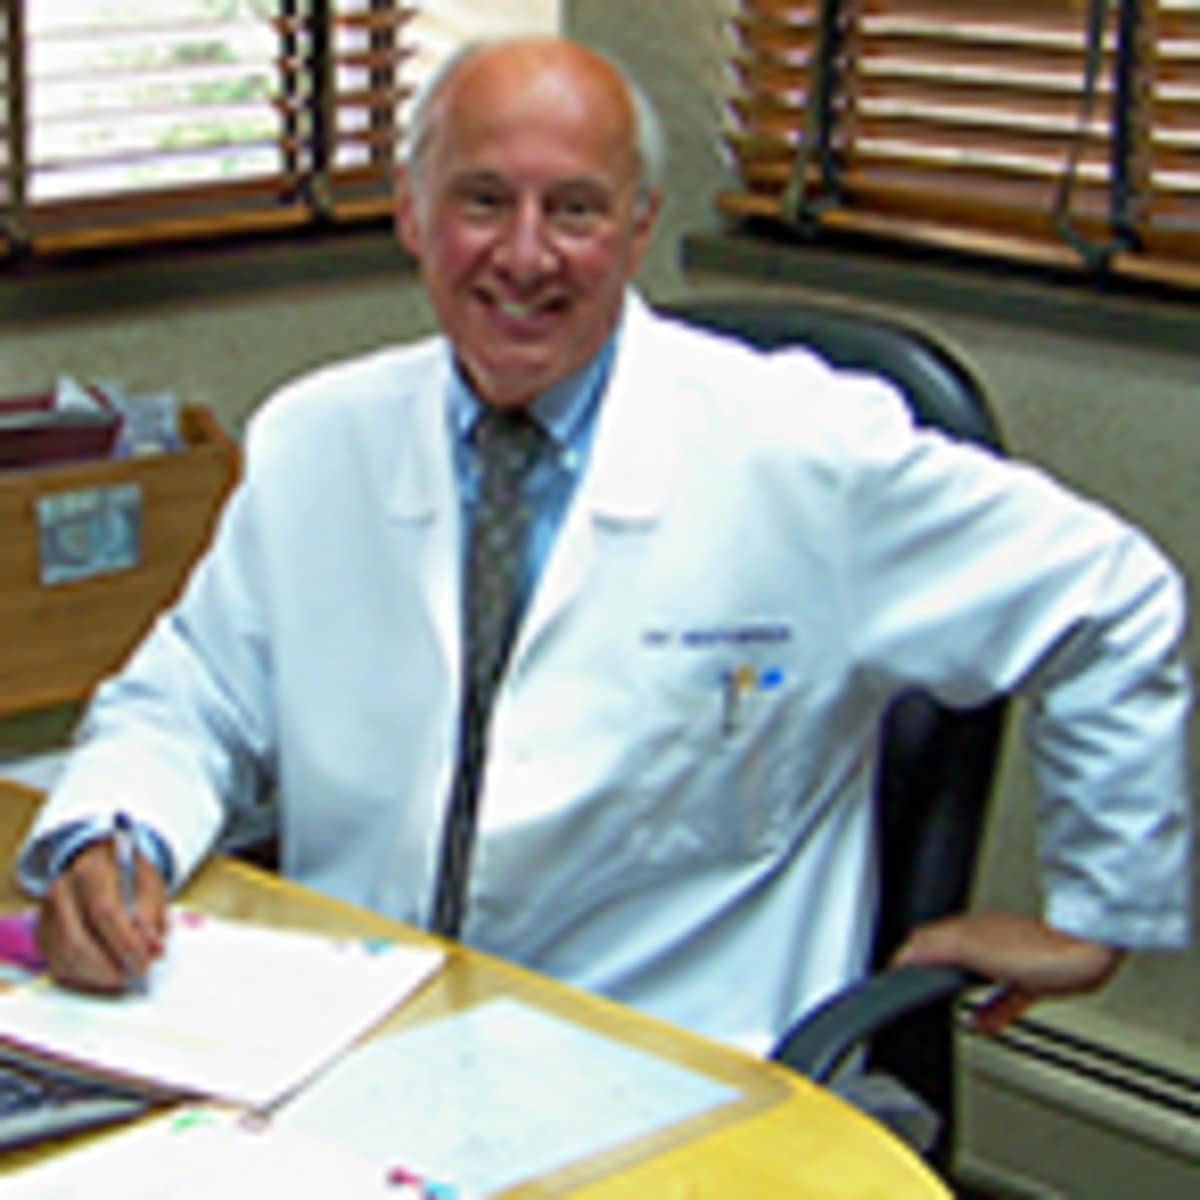 Dr. Jeffrey Binder, DO